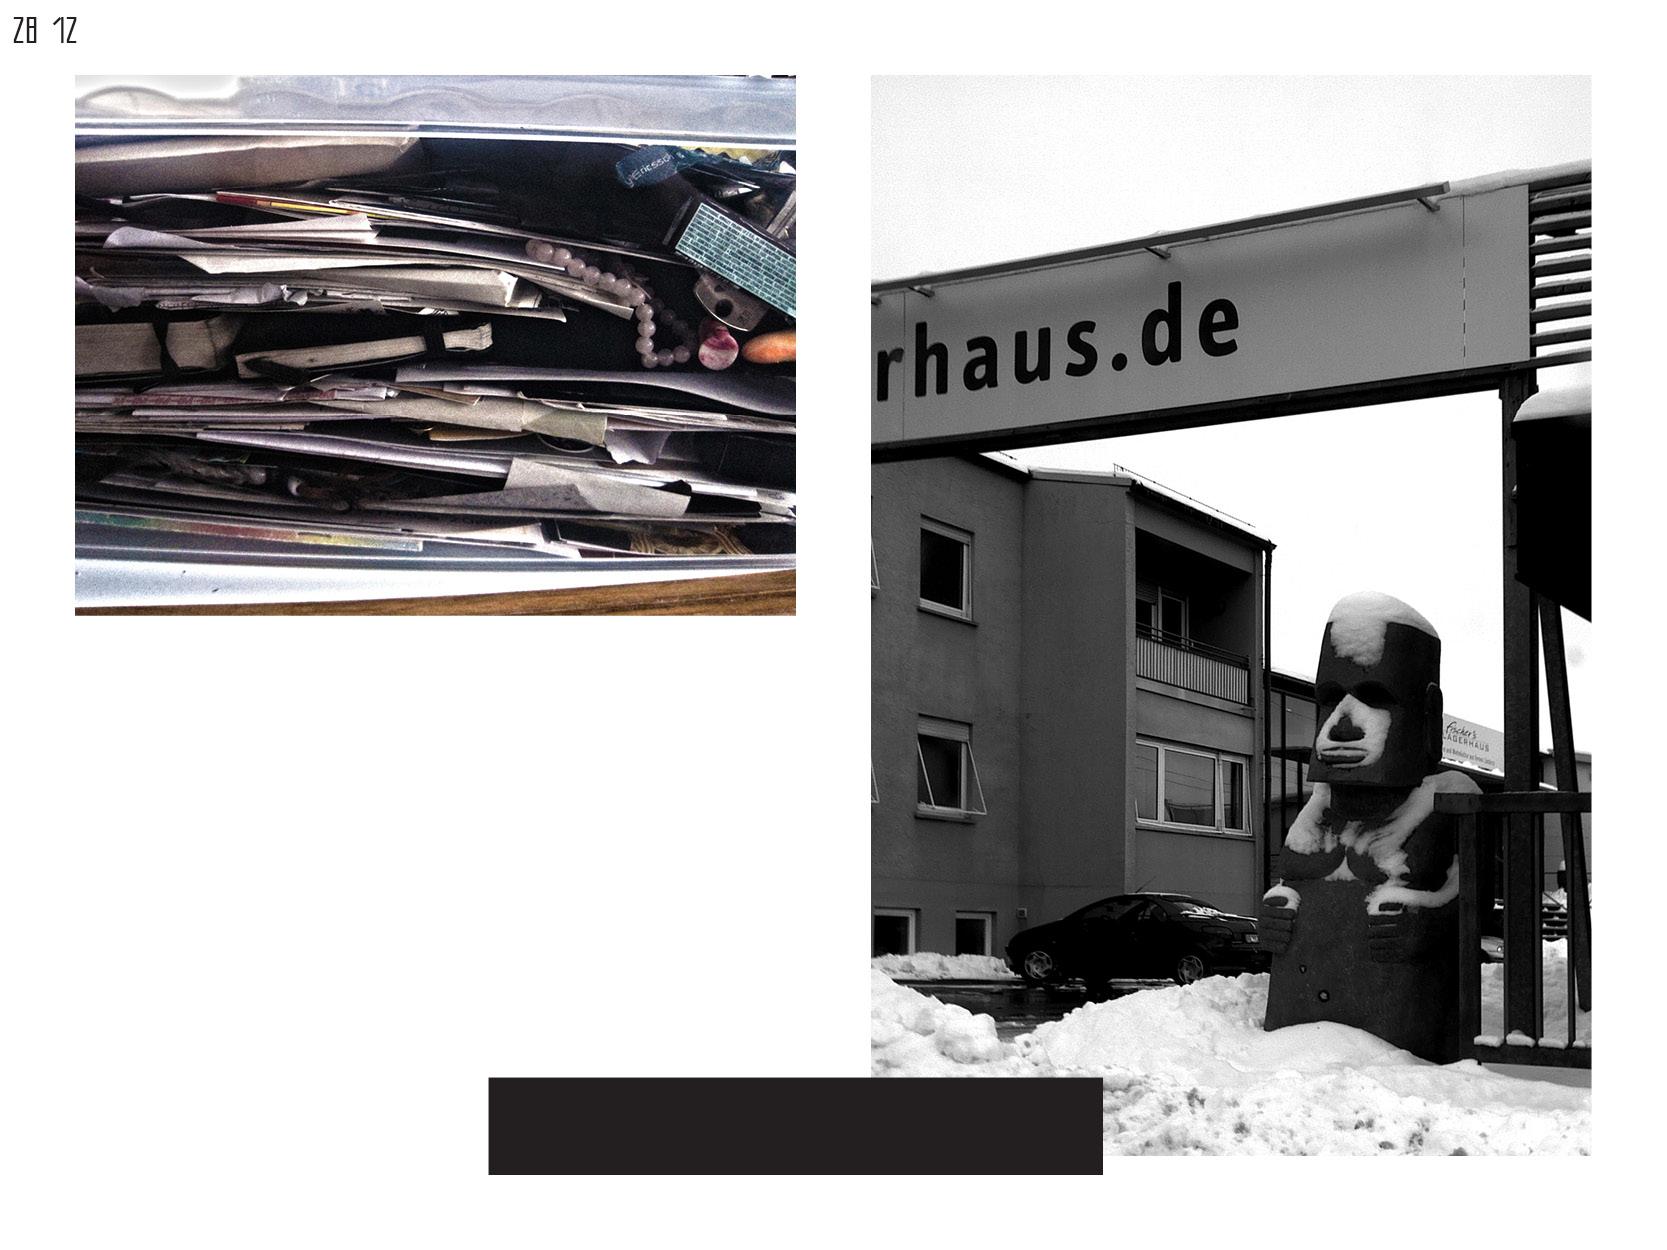 Gerrit-Schweiger-Dialog-Städte-Paris-Berlin-Jessica-Blank-Experiment-Fotoserie-Tagebuch-visuelle-Kommunikation-64